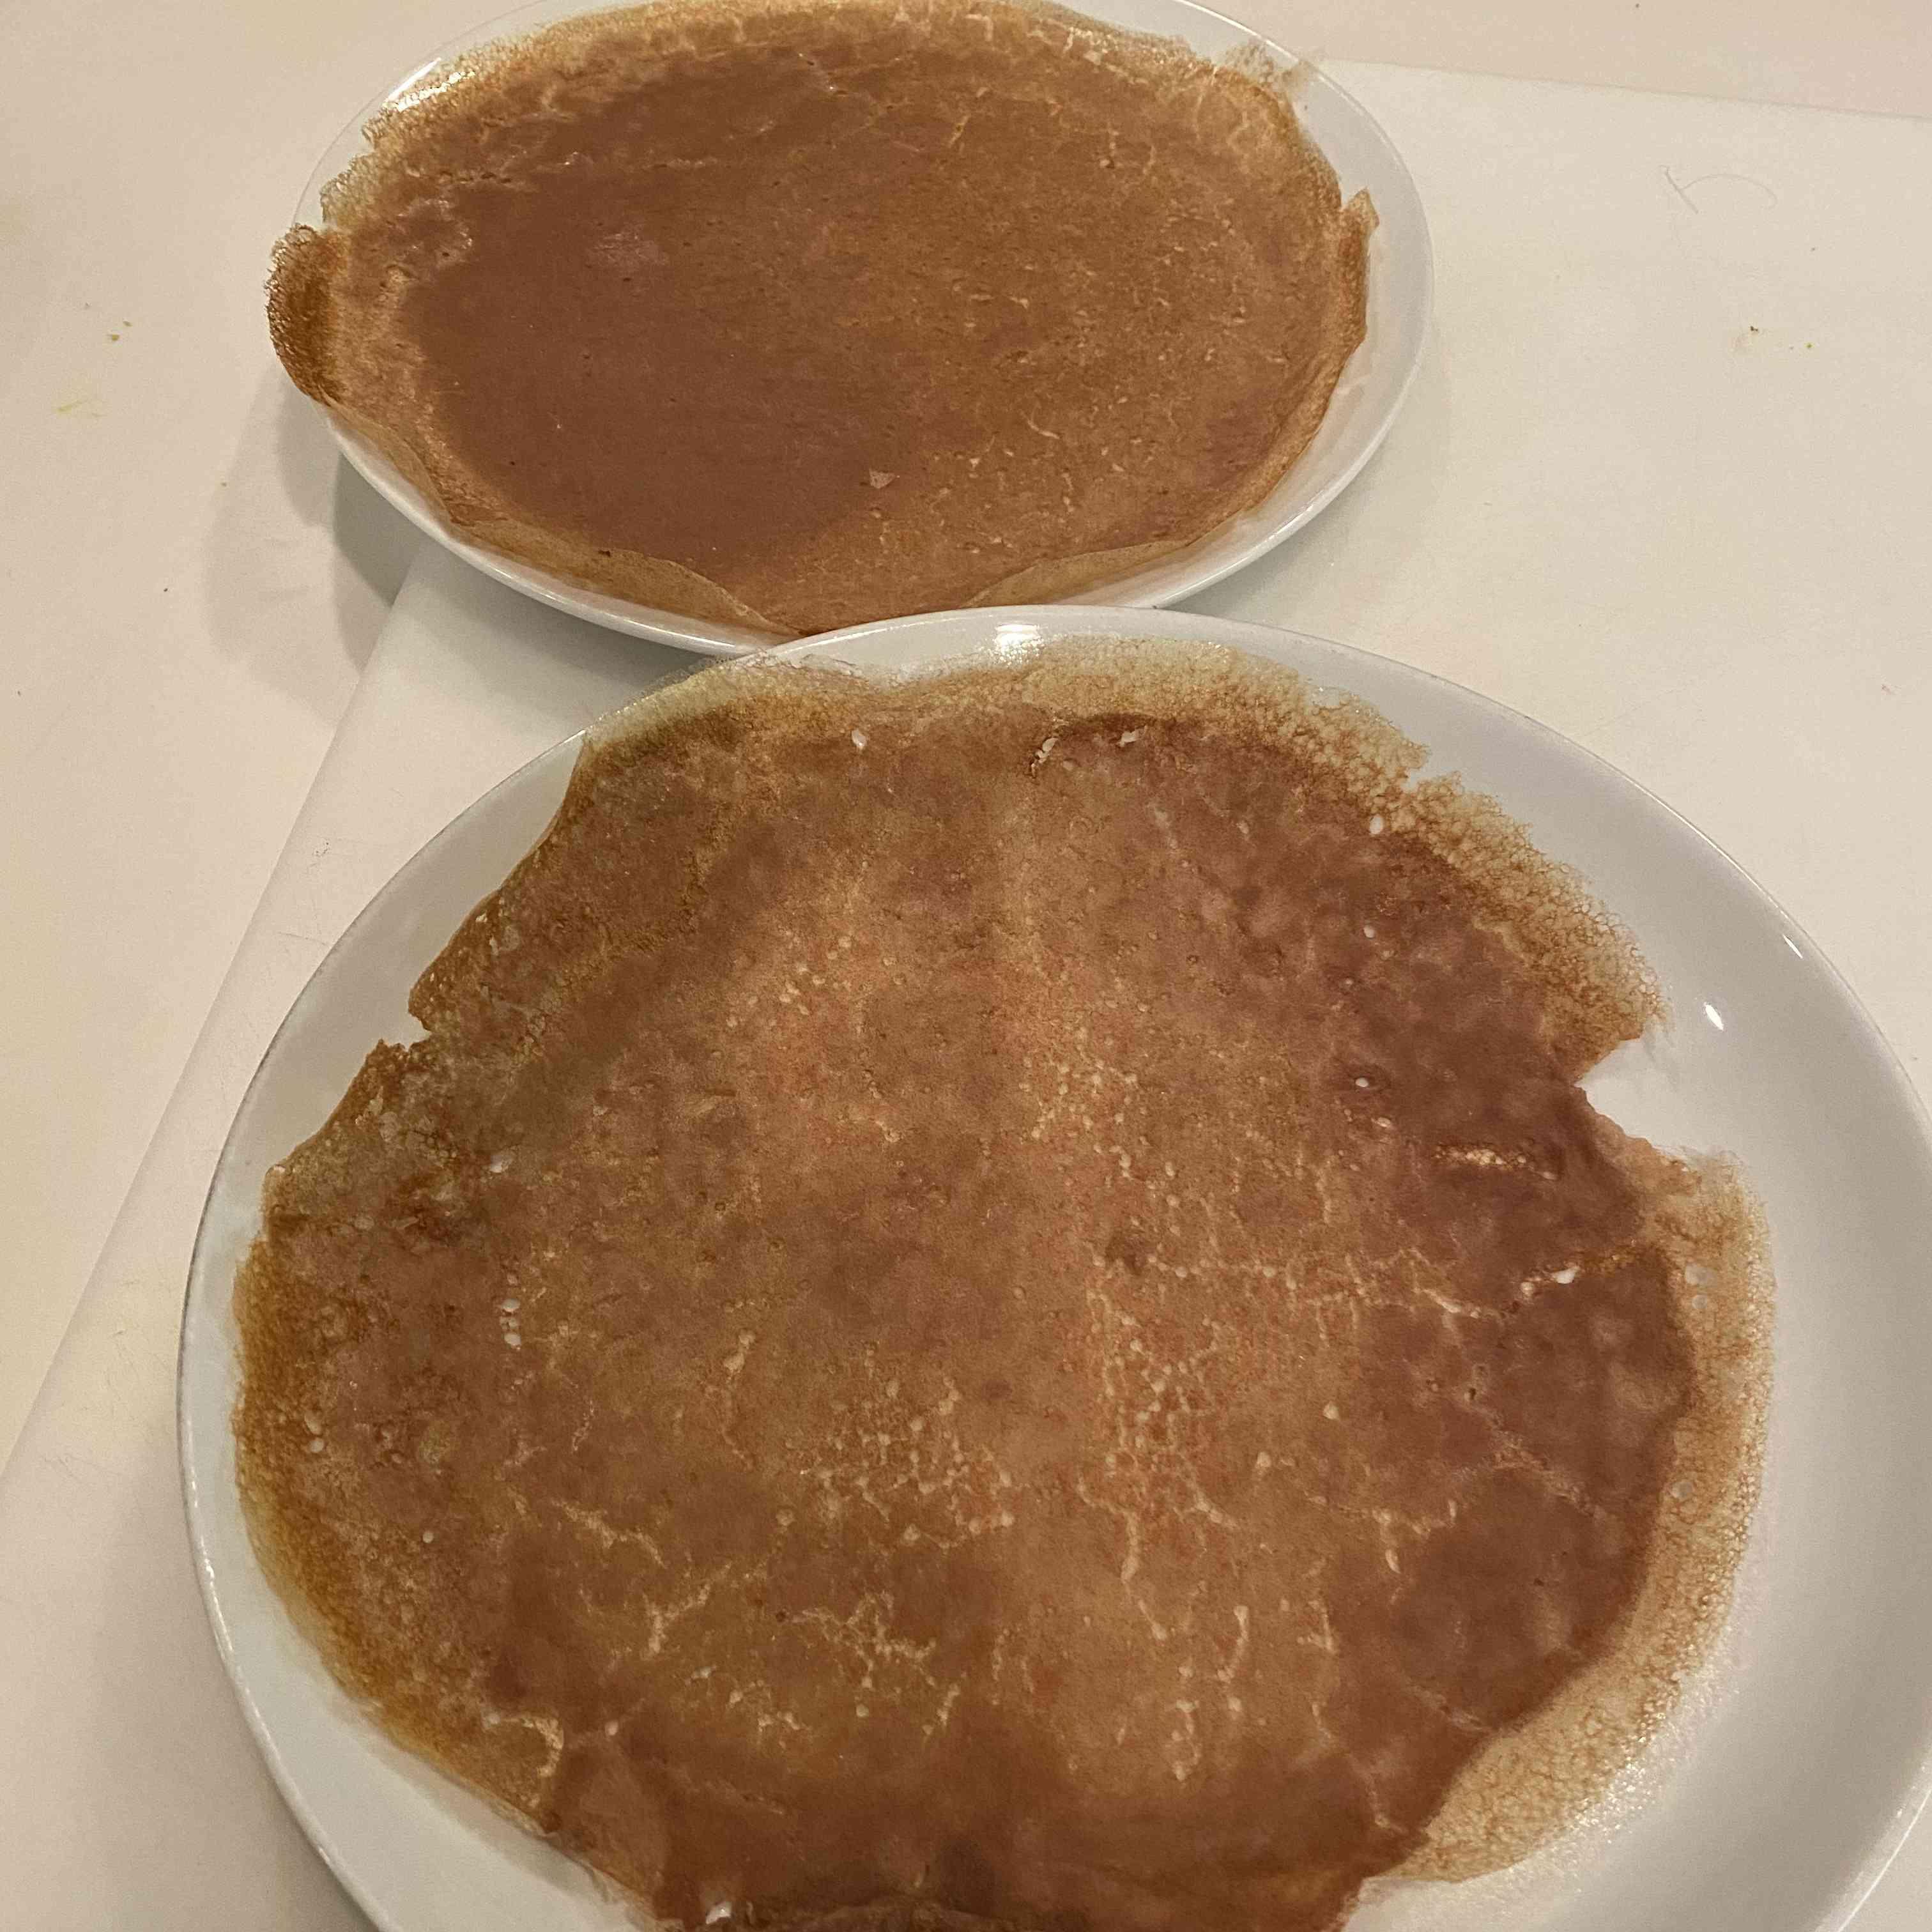 Injera (Ethiopian Sour Flatbread) Tester Image